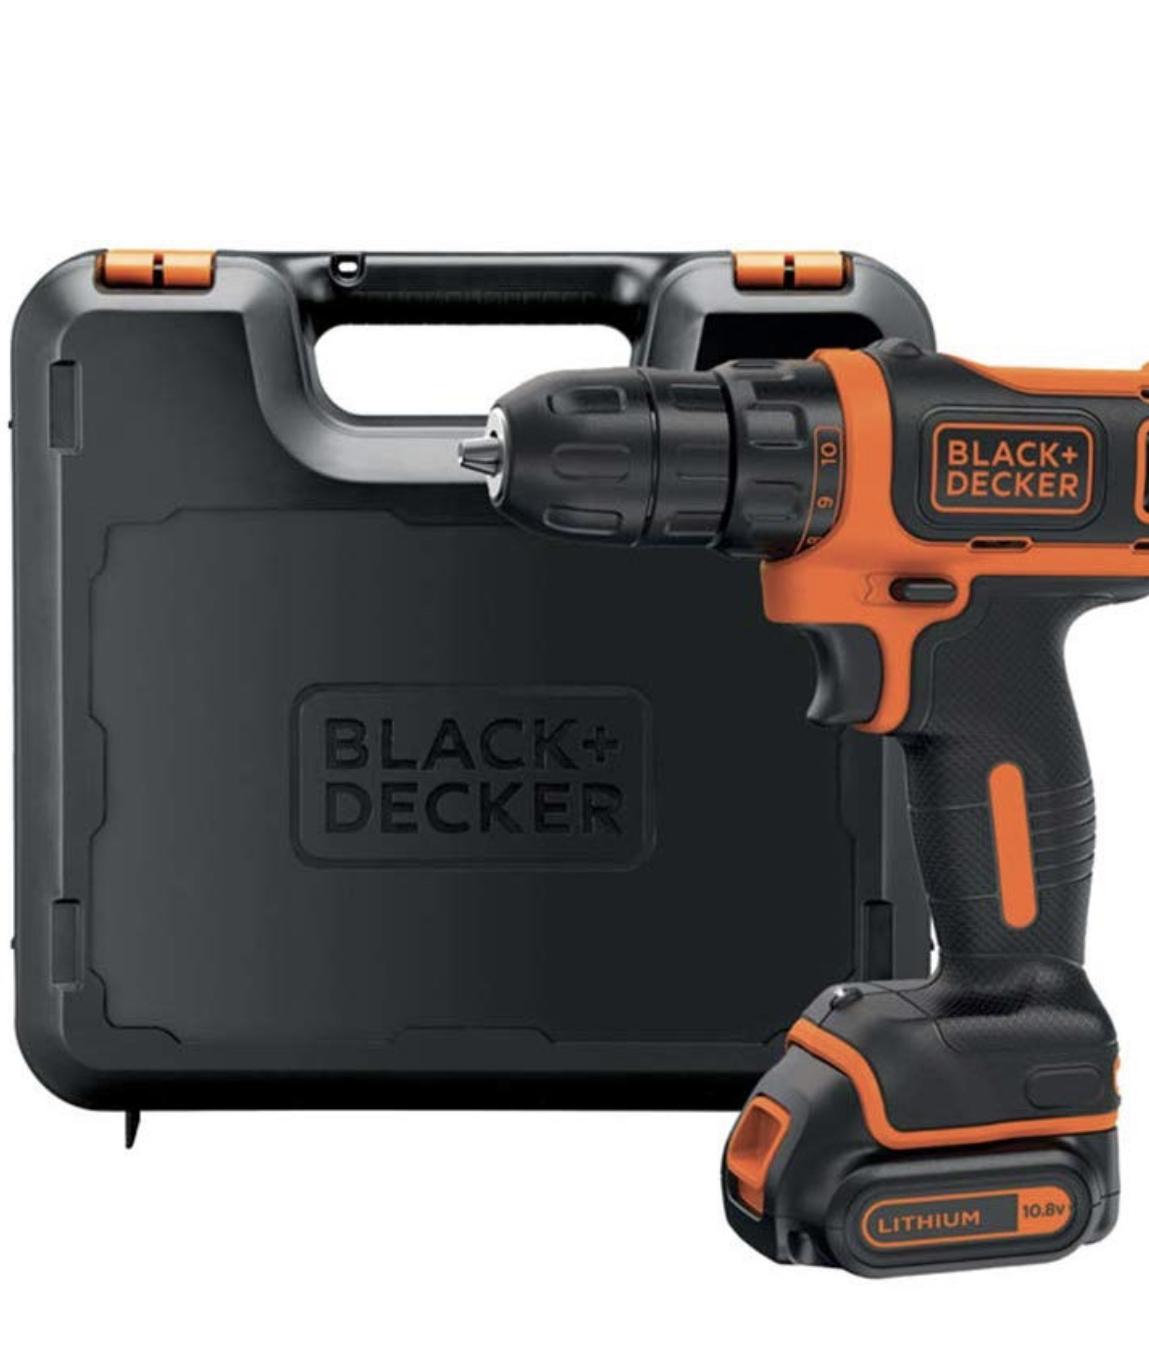 Black+Decker BDCDD12K-QW - Taladro atornillador 10.8 V